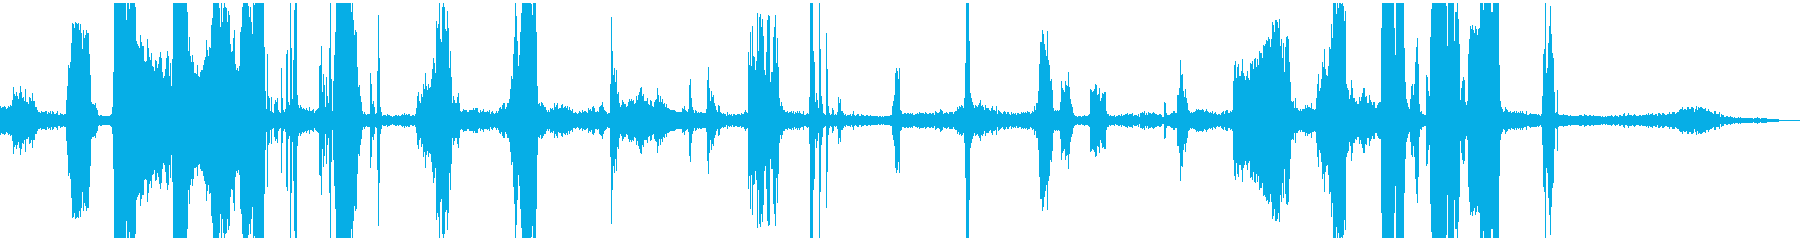 REAGAN'S SPLIT PE...の再生済みの波形